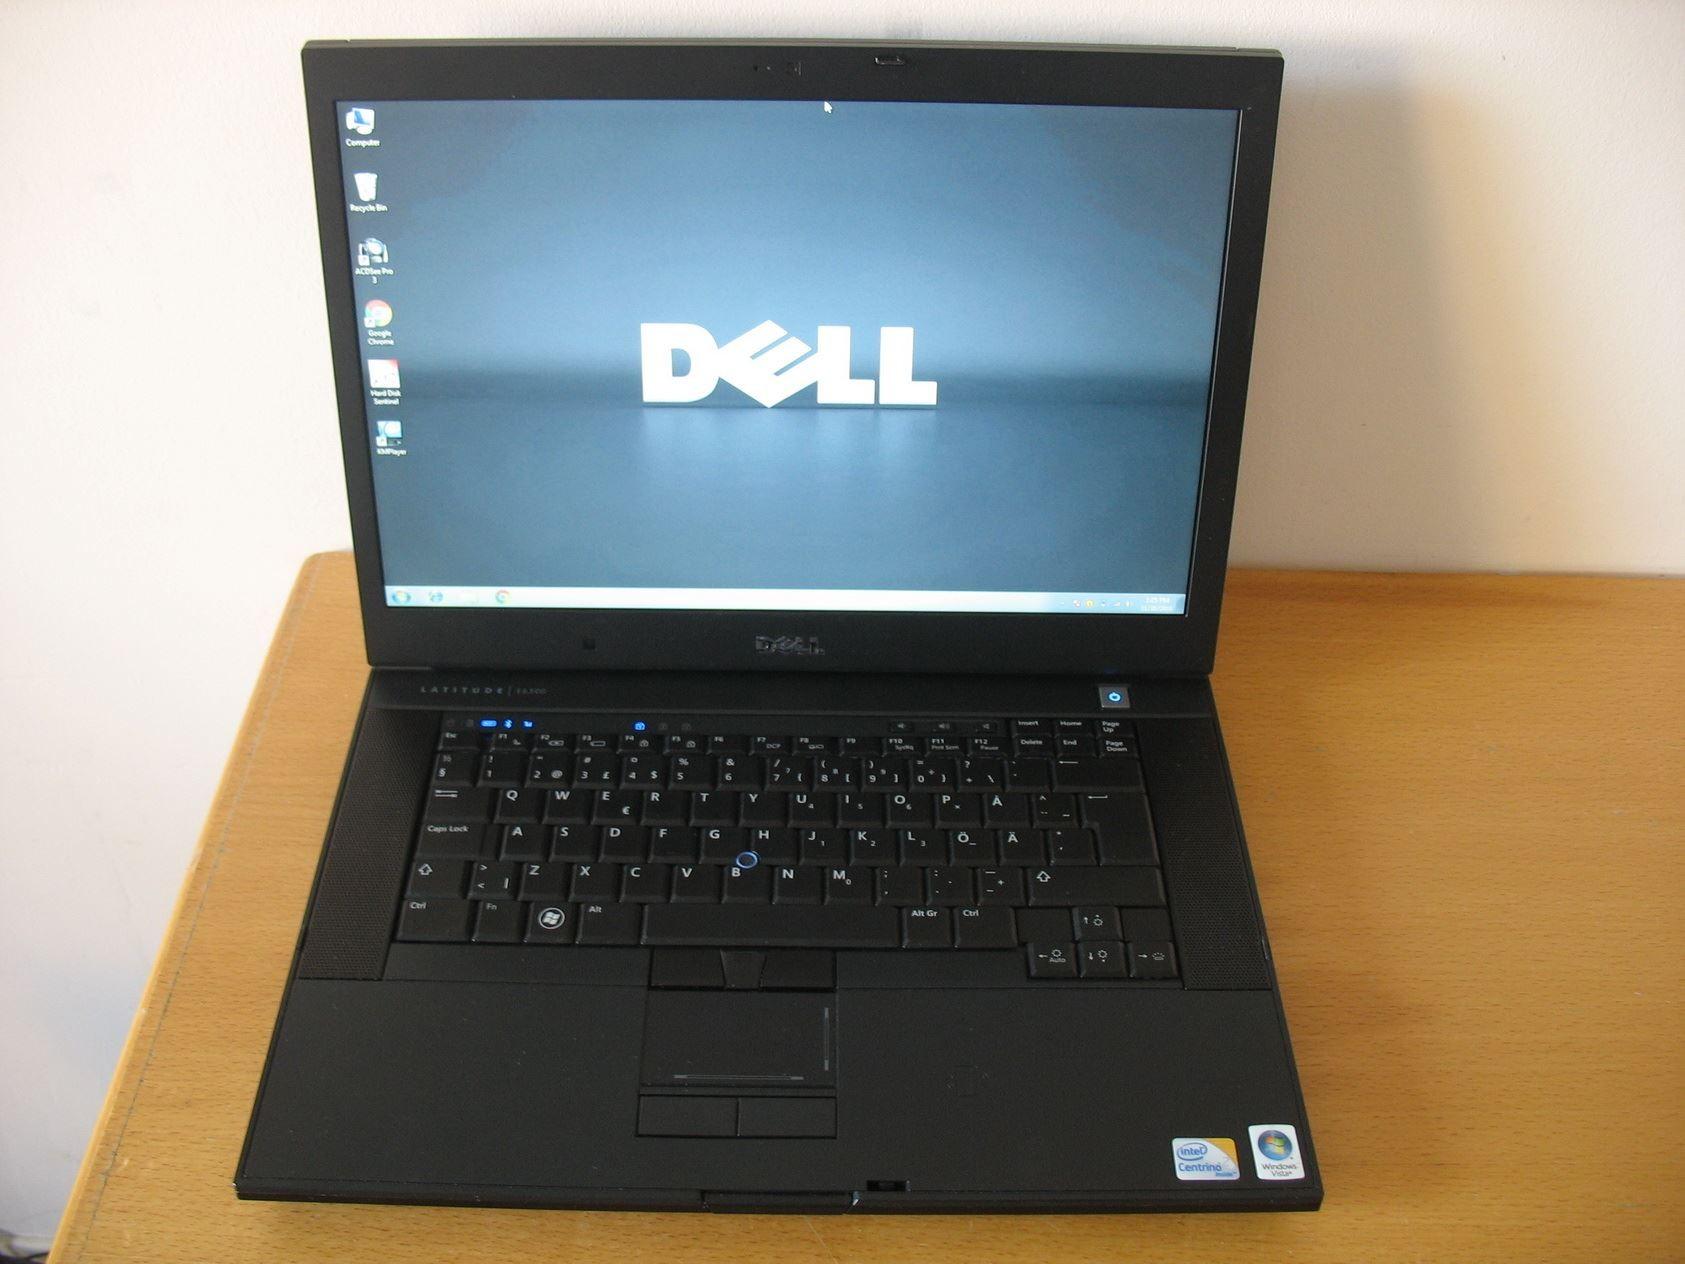 Dell Latitude E6500 - Kupindo com (36264219)